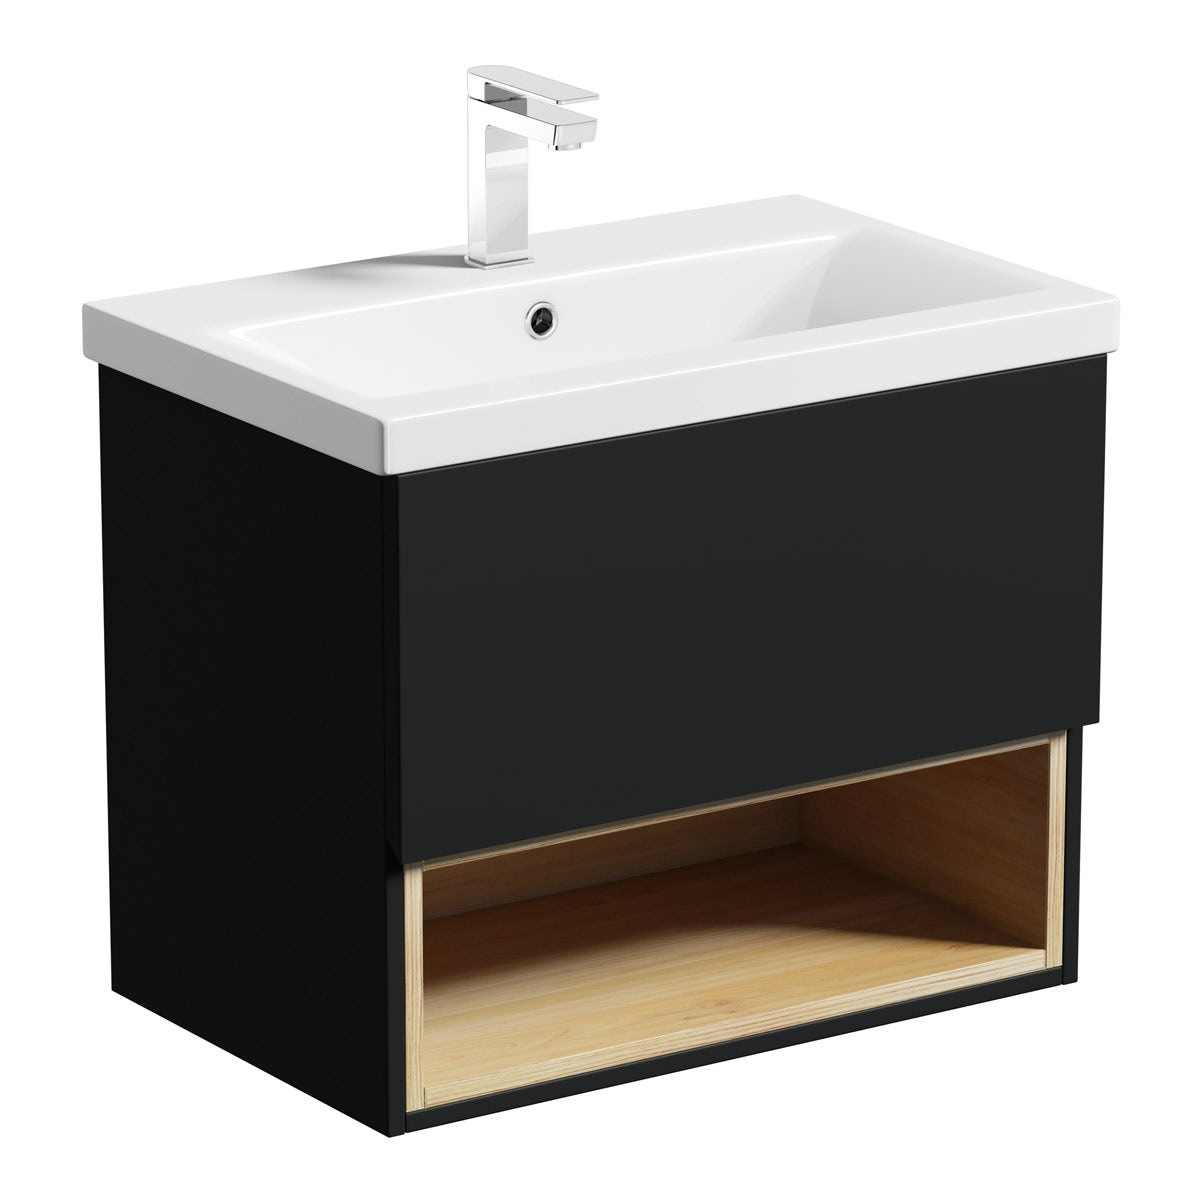 Tate White & Oak 600 wall hung vanity unit with basin